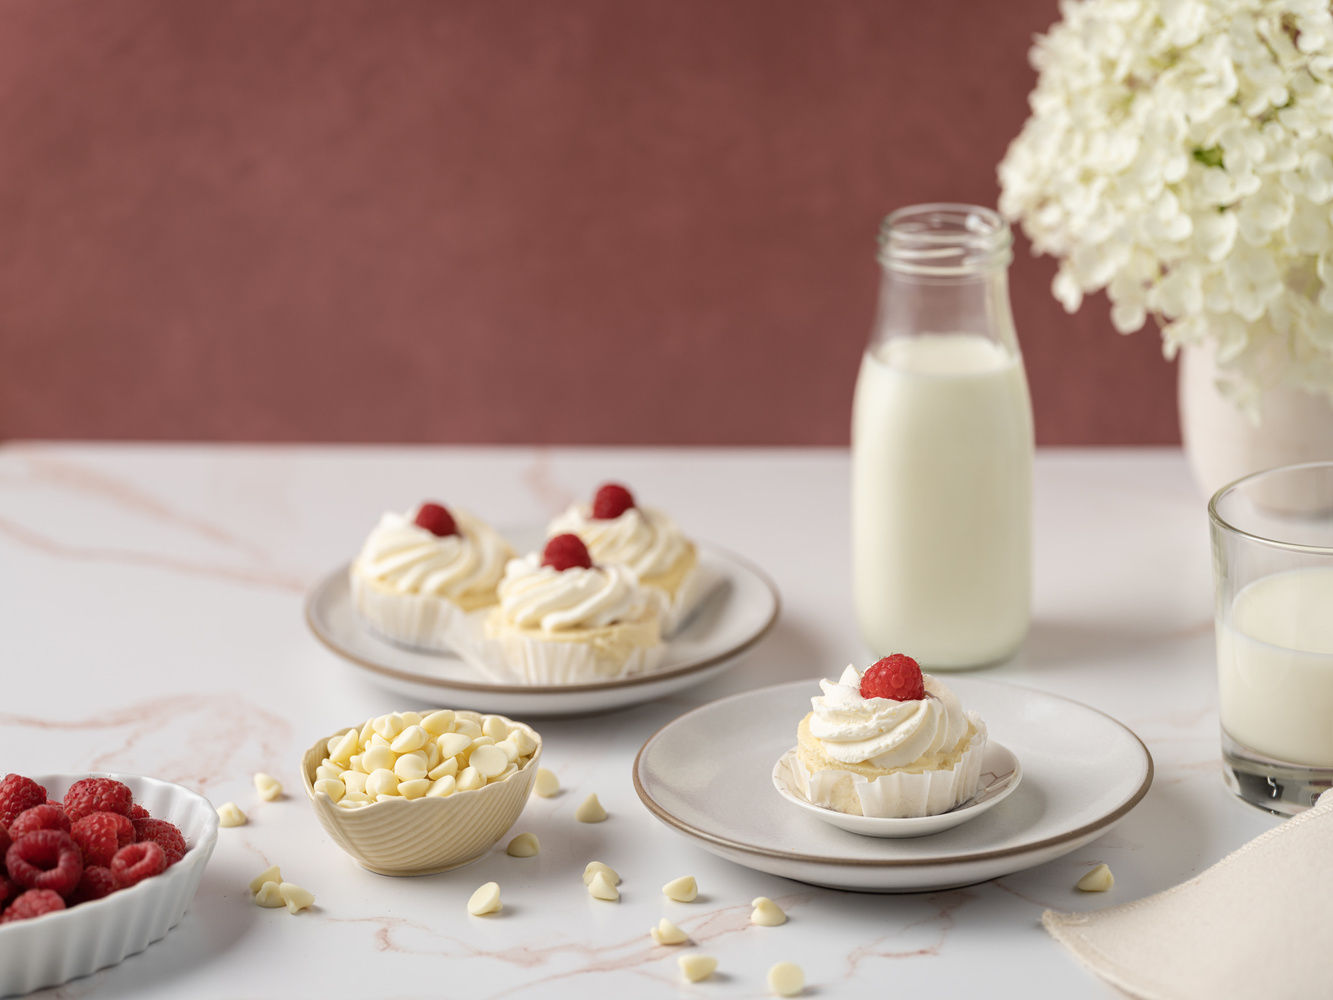 Cheesecake by Skyler Ewing